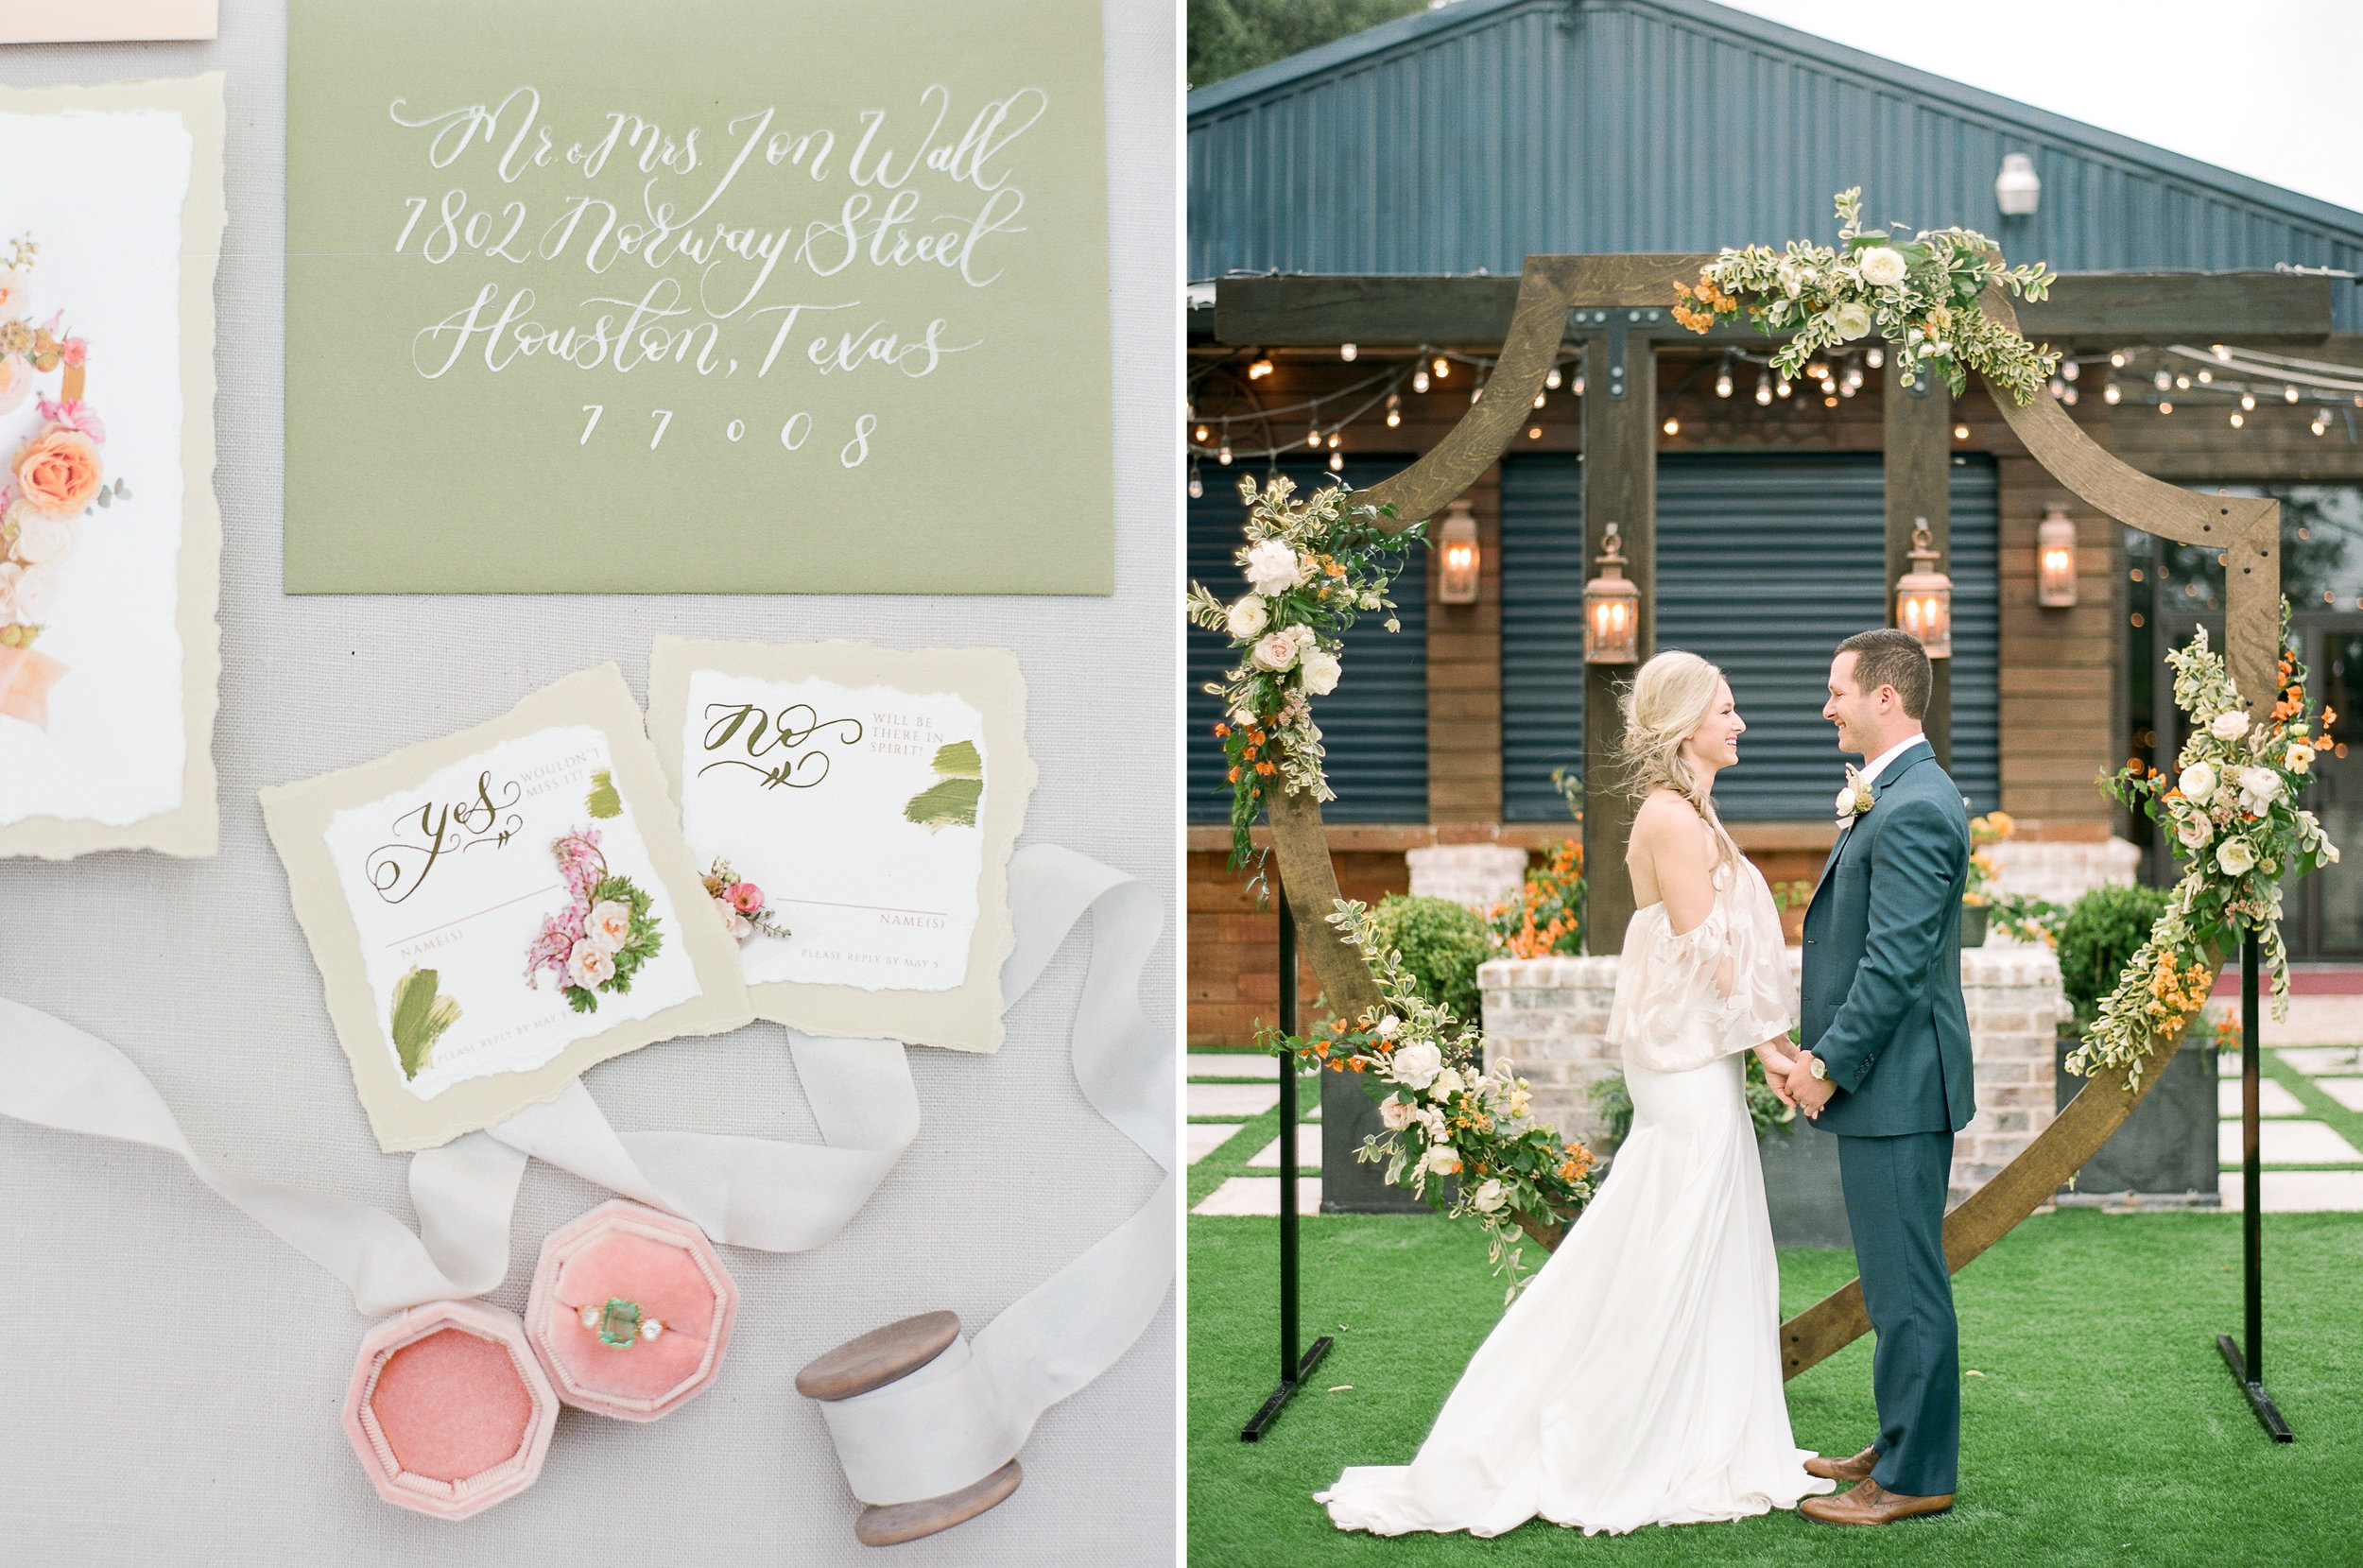 Houston-Wedding-Photographer-Fine-Art-Film-Destination-Style-Me-Pretty-Austin-Dallas-New-Orleans-Dana-Fernandez-Photography-108.jpg